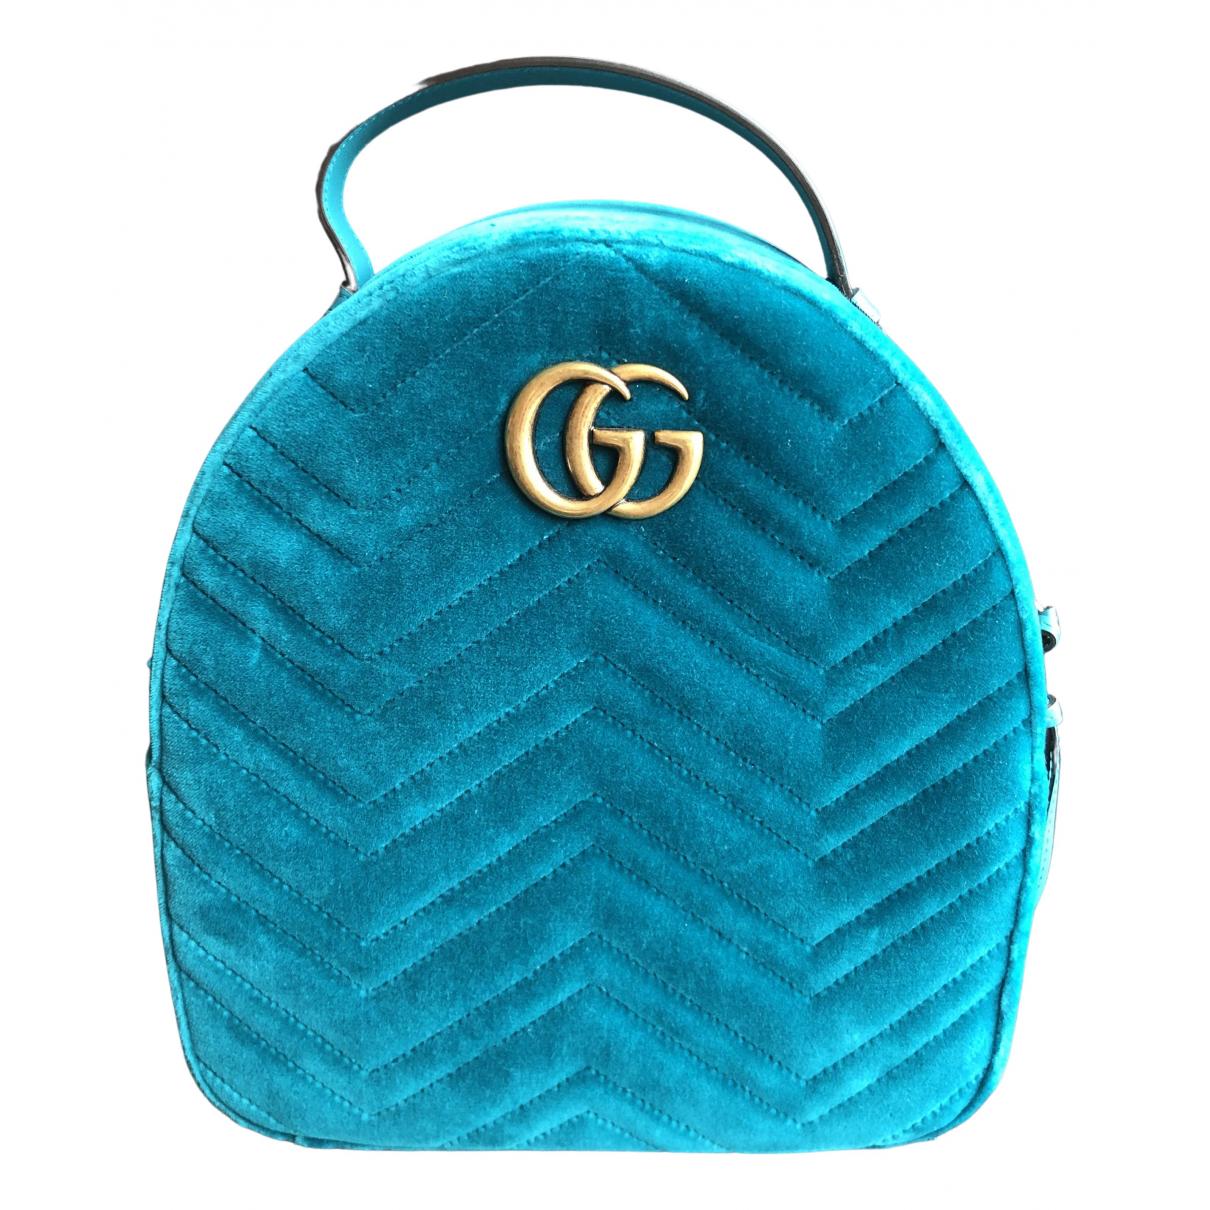 Gucci Marmont Turquoise Velvet backpack for Women N